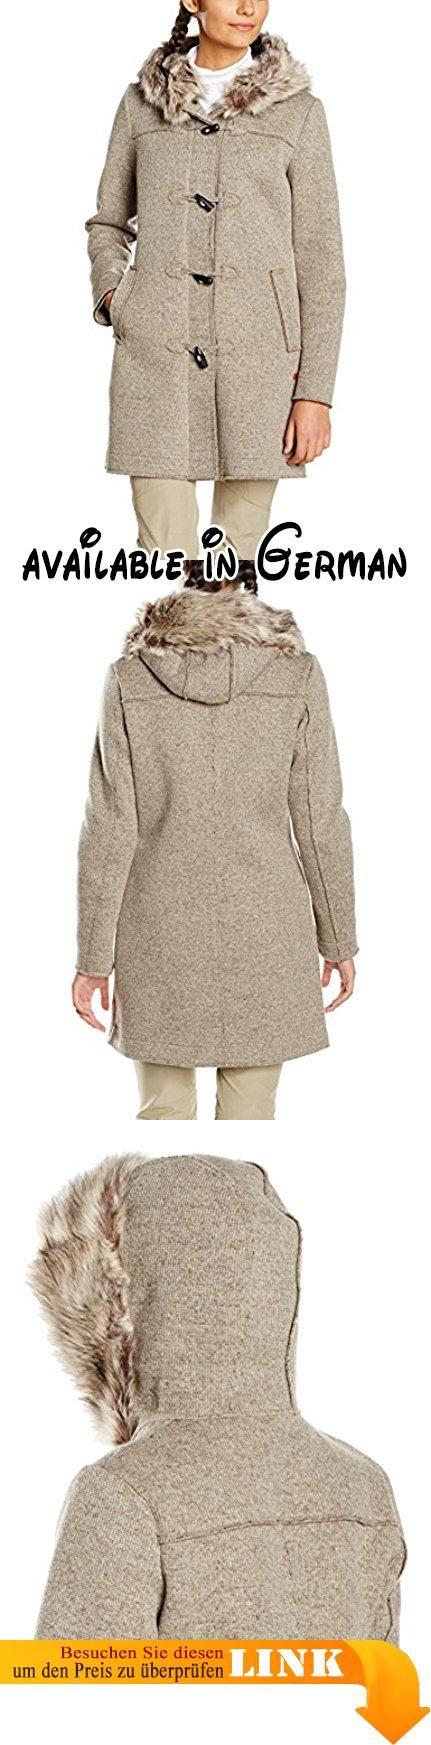 CMP Damen Walk/Woll-Mantel Walkmantel, Sand Mel/Wood, 44. Wollmantel. Walkmantel. modisch und trendy. Wooltech. Windabweisend #Sports #SPORTING_GOODS